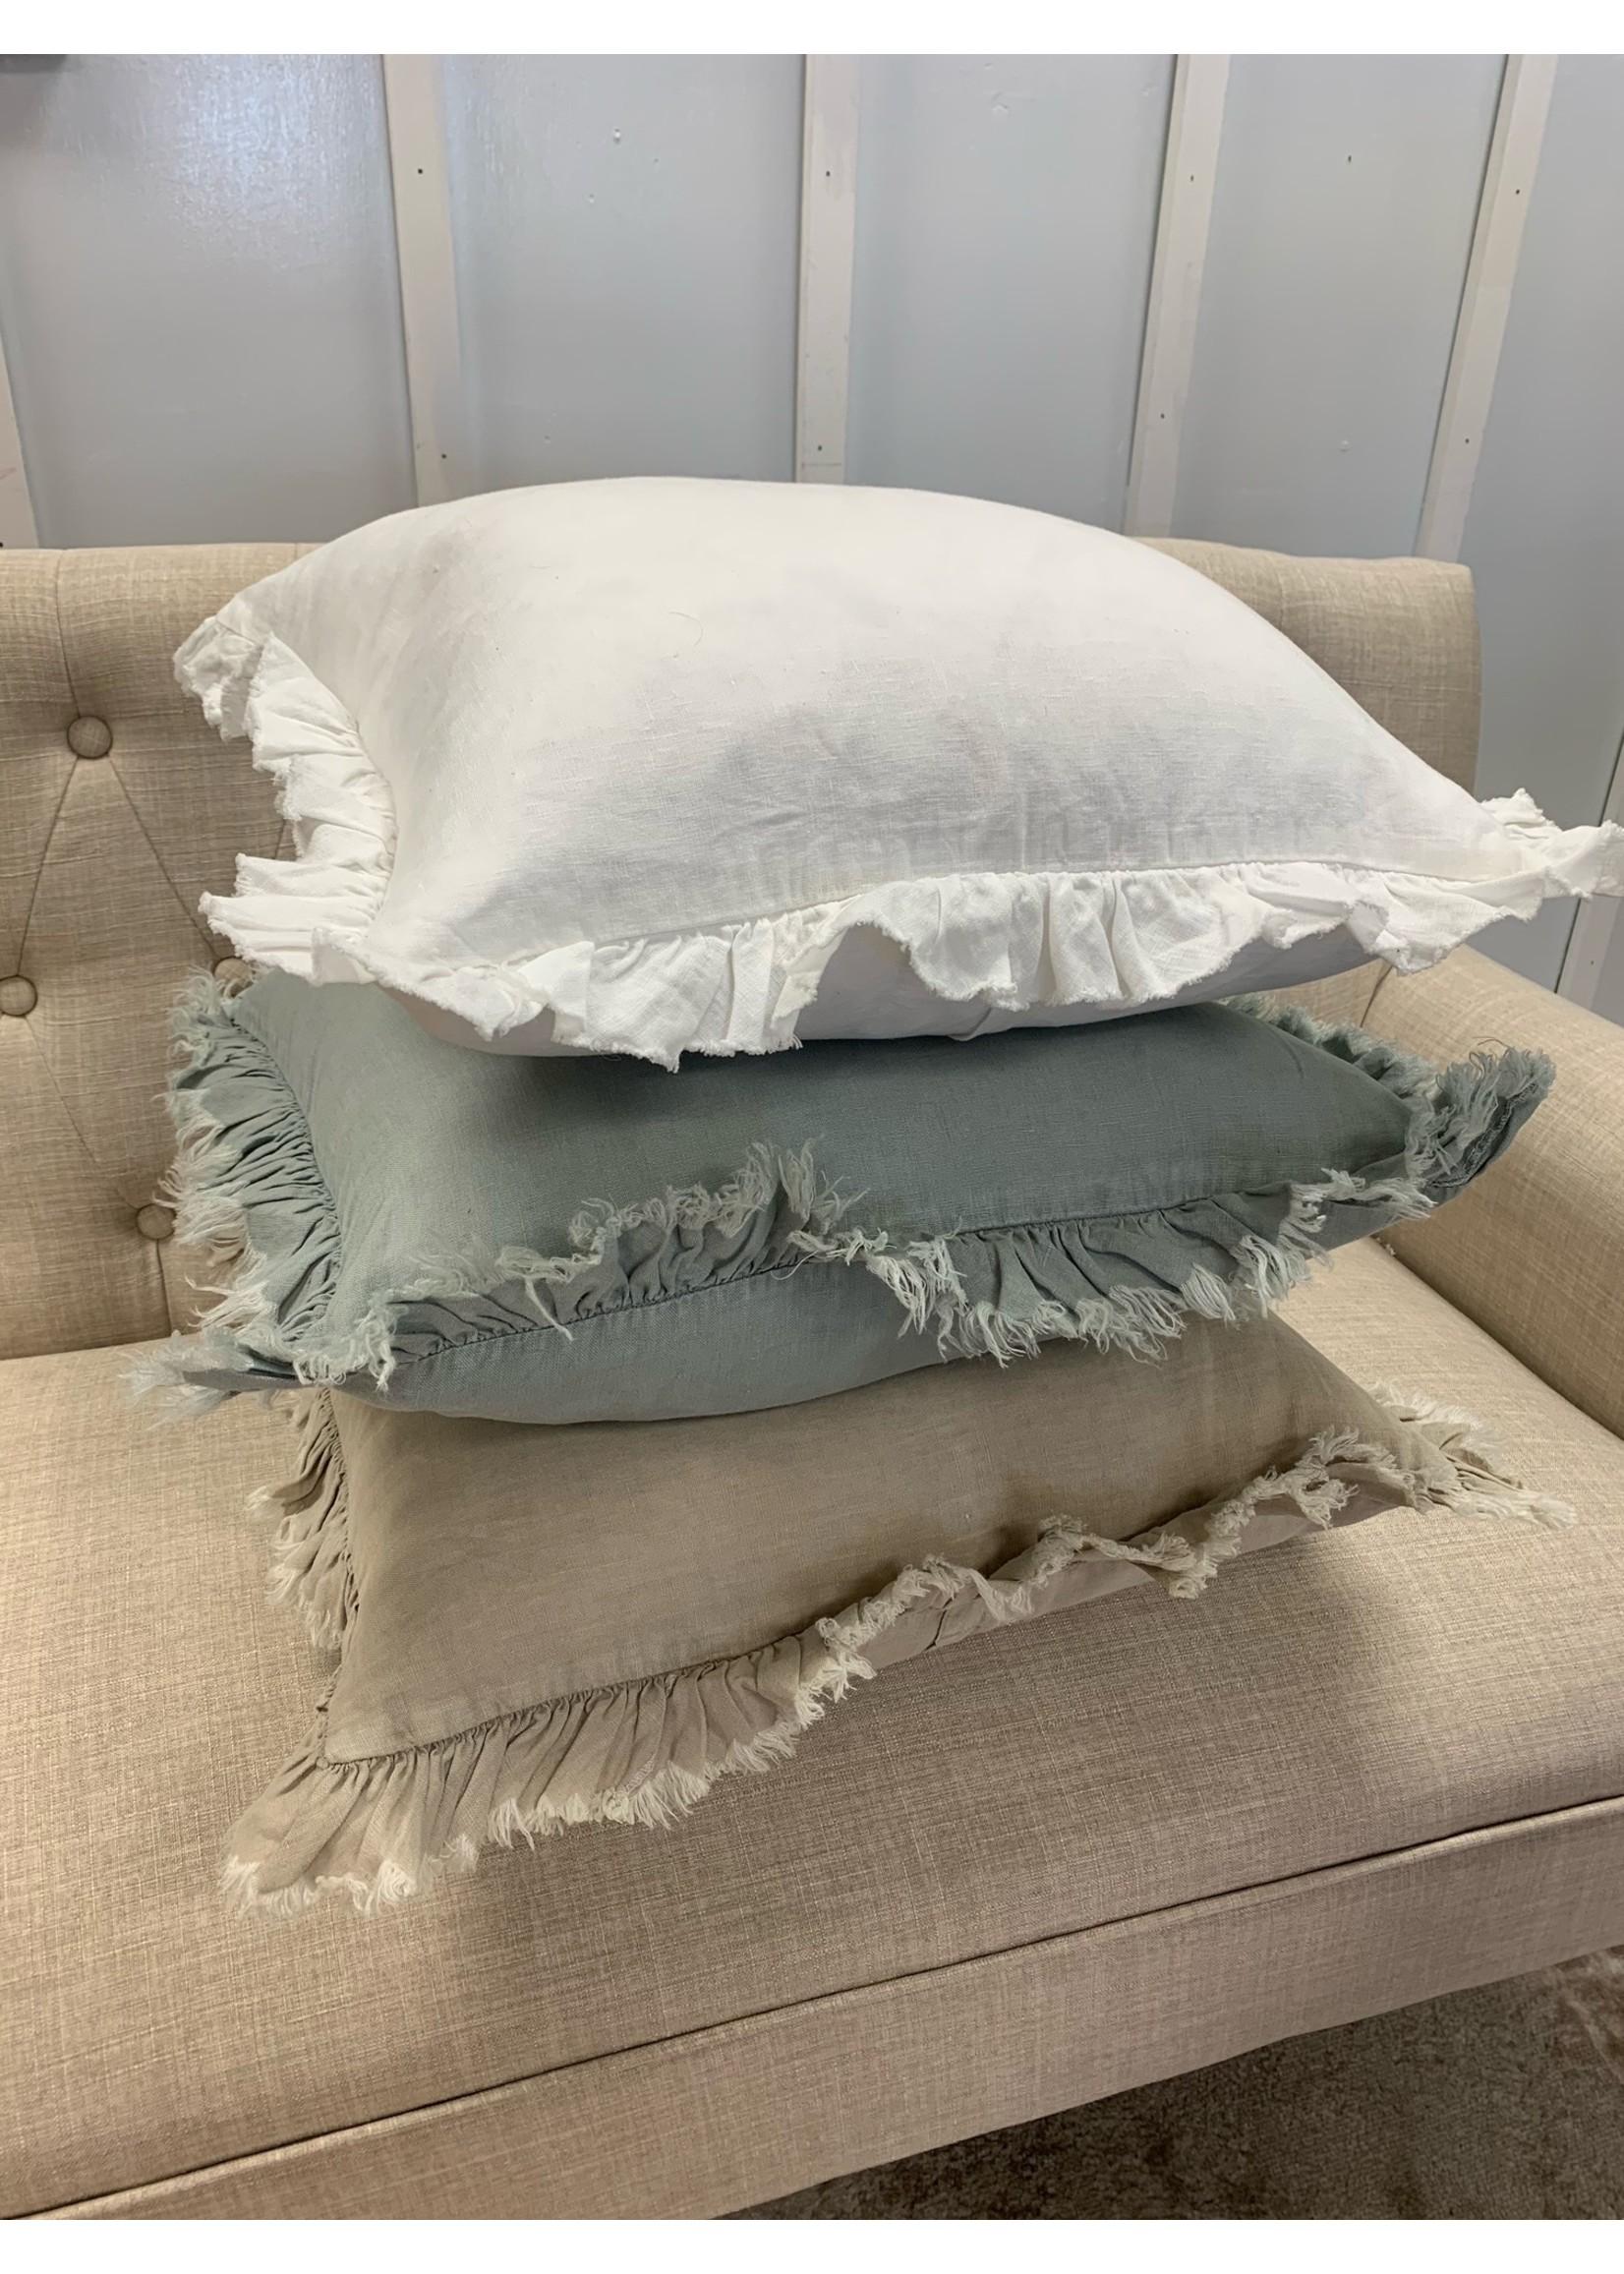 Saro Trading Company Ruffled Design Pillow - Blue